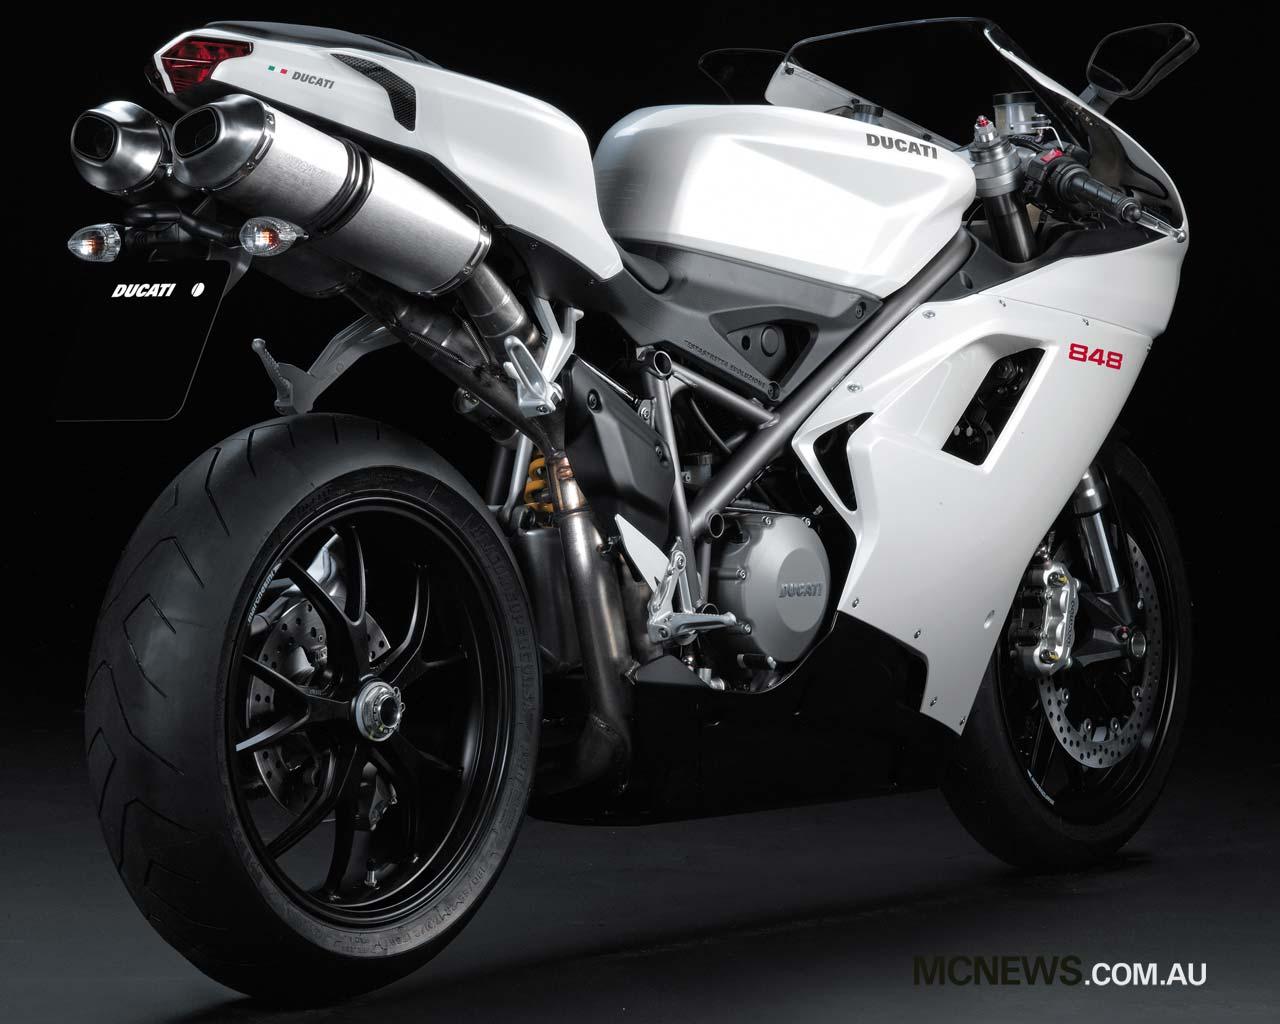 New Bikes: D... Ducati Motorcycles